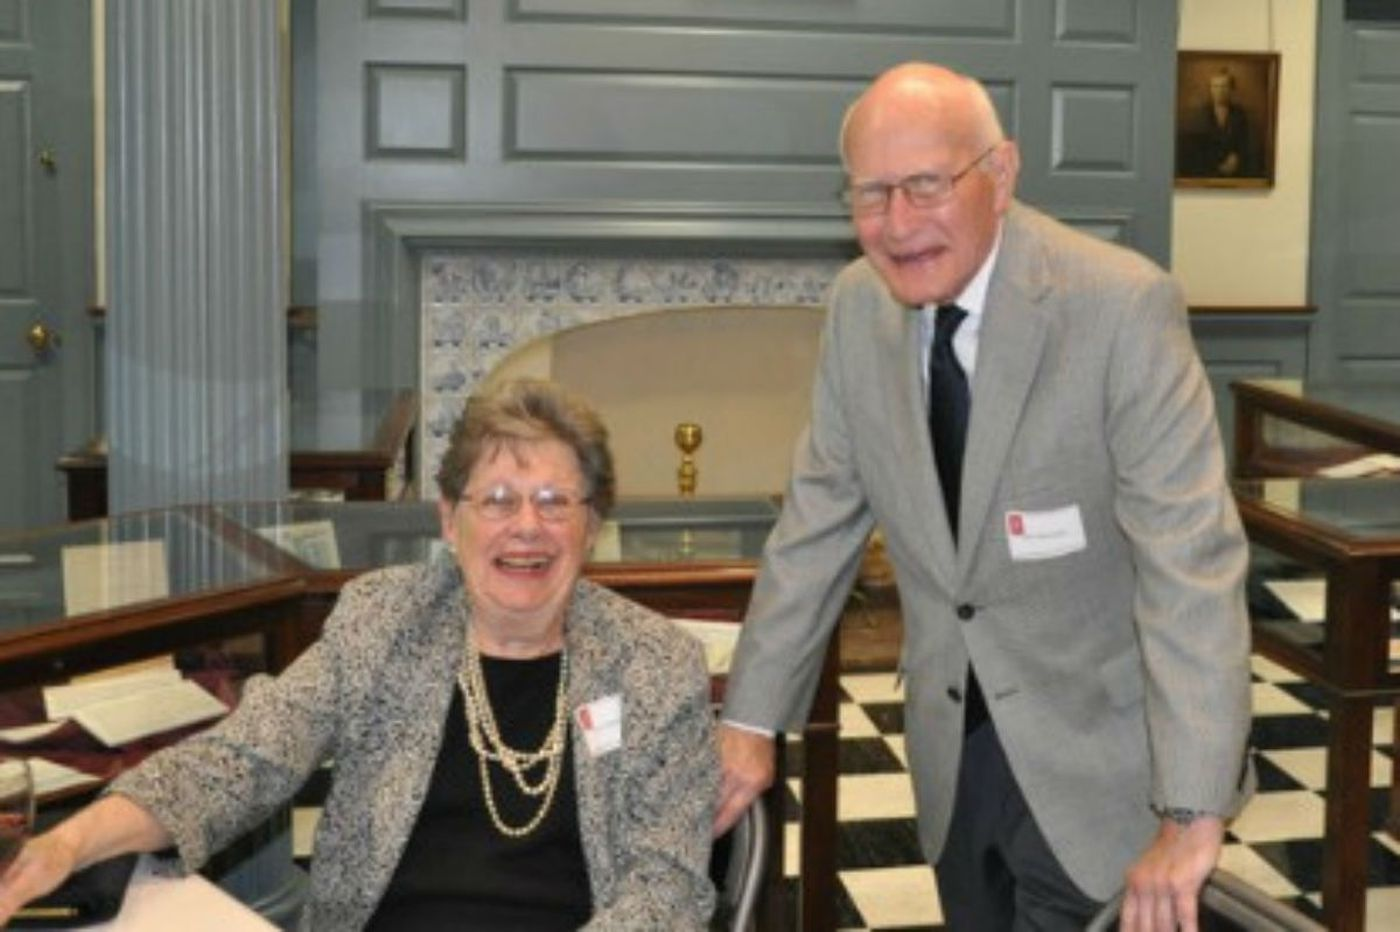 Doris B. Steinberg, 87, founder of East Falls Village to help seniors